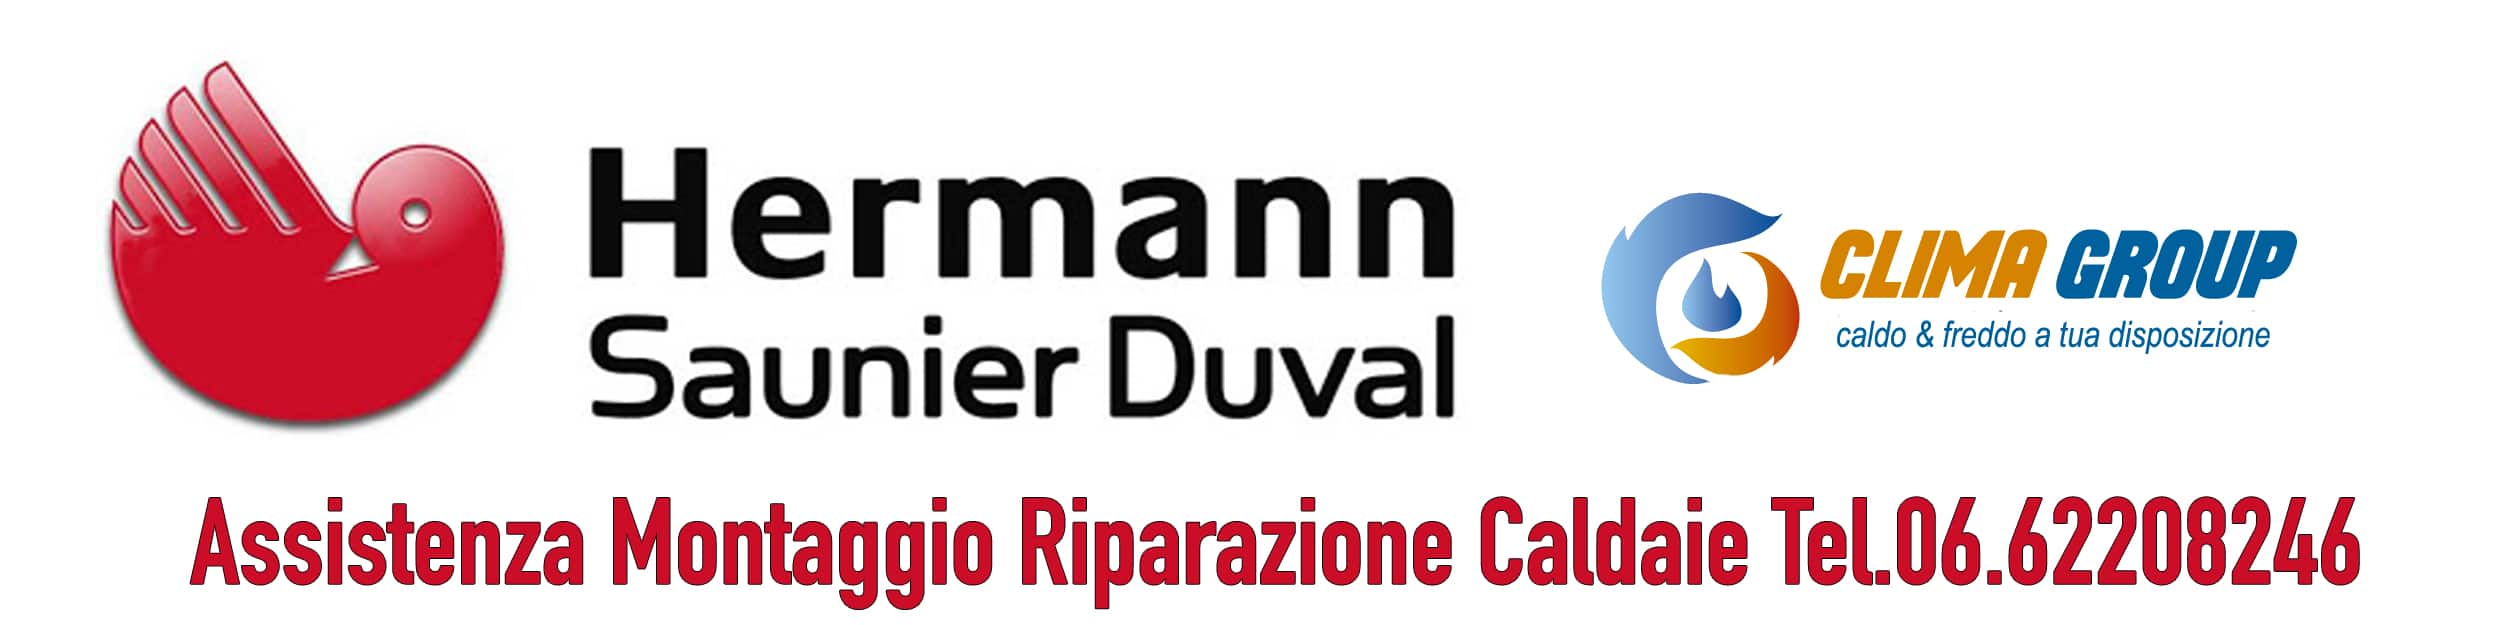 Assistenza caldaie Hermann Roma